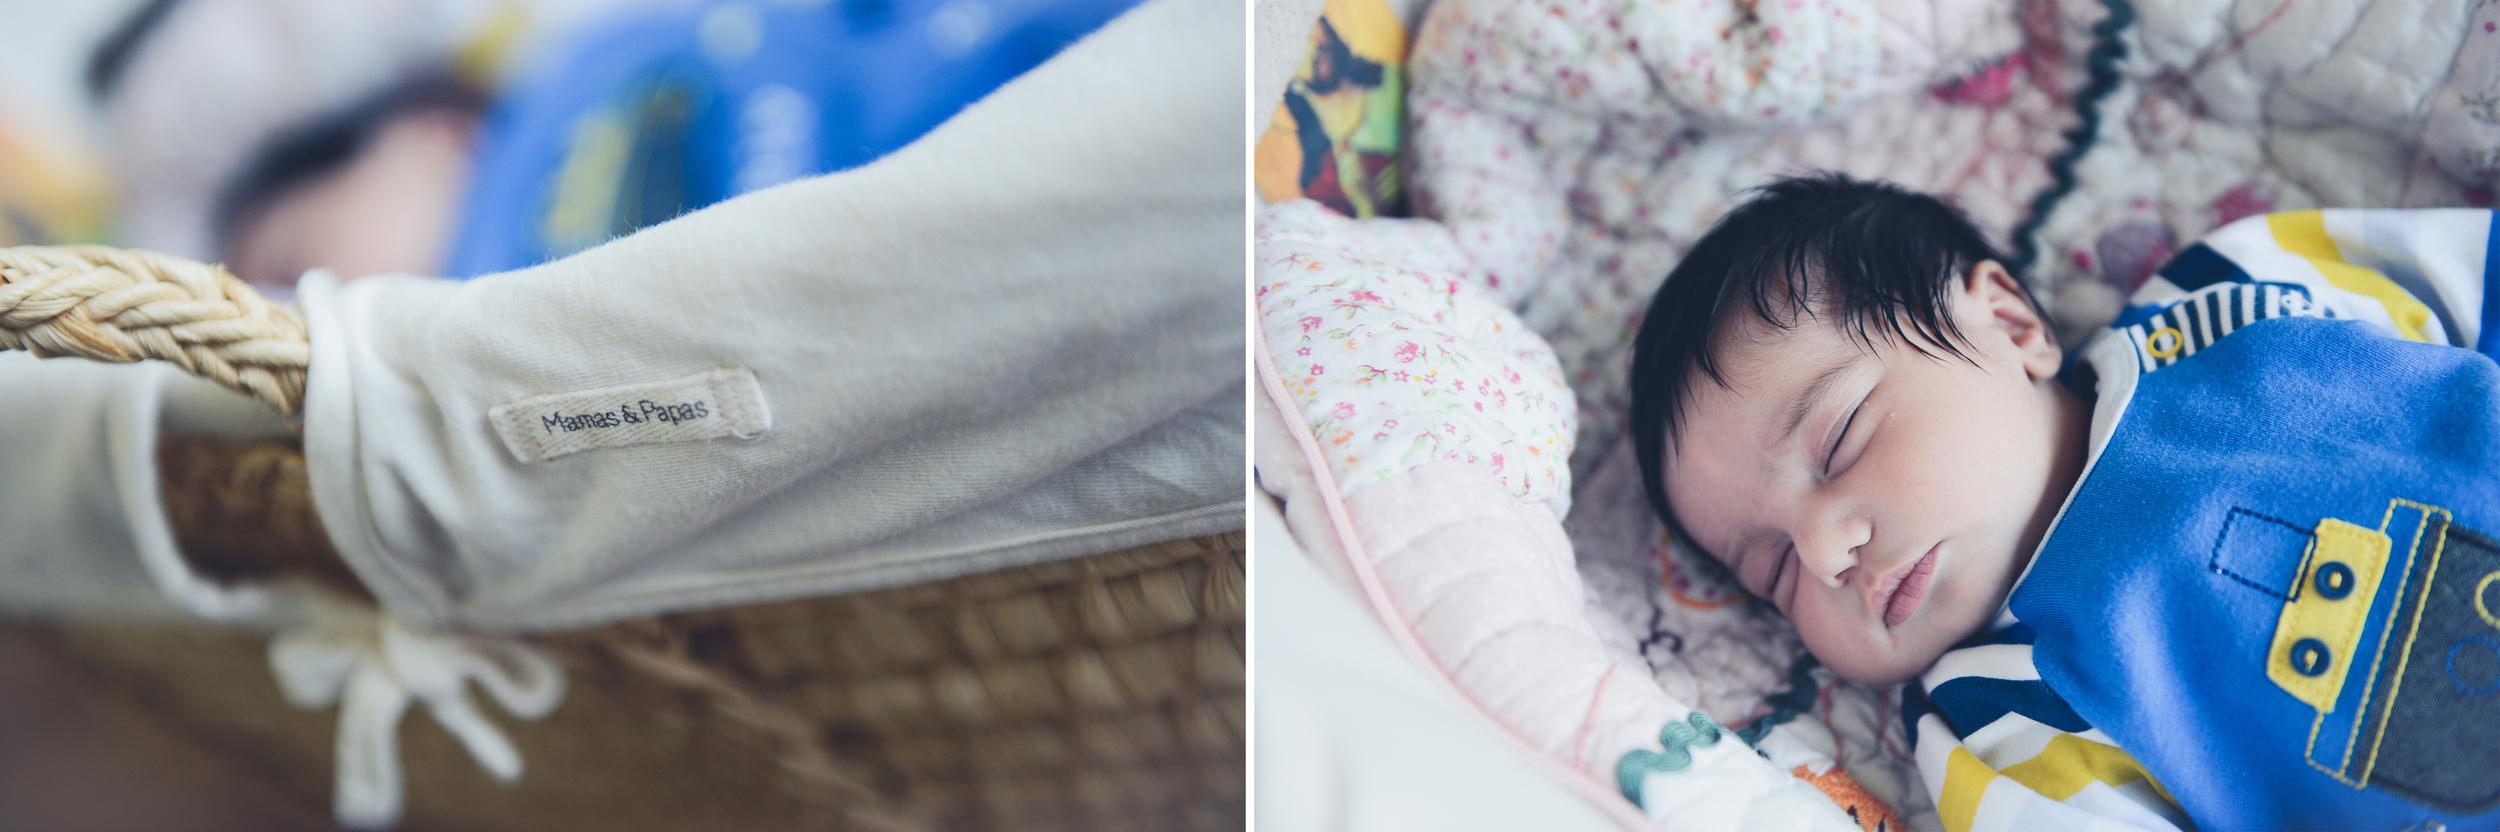 Baby Nicholas-47.1.jpg